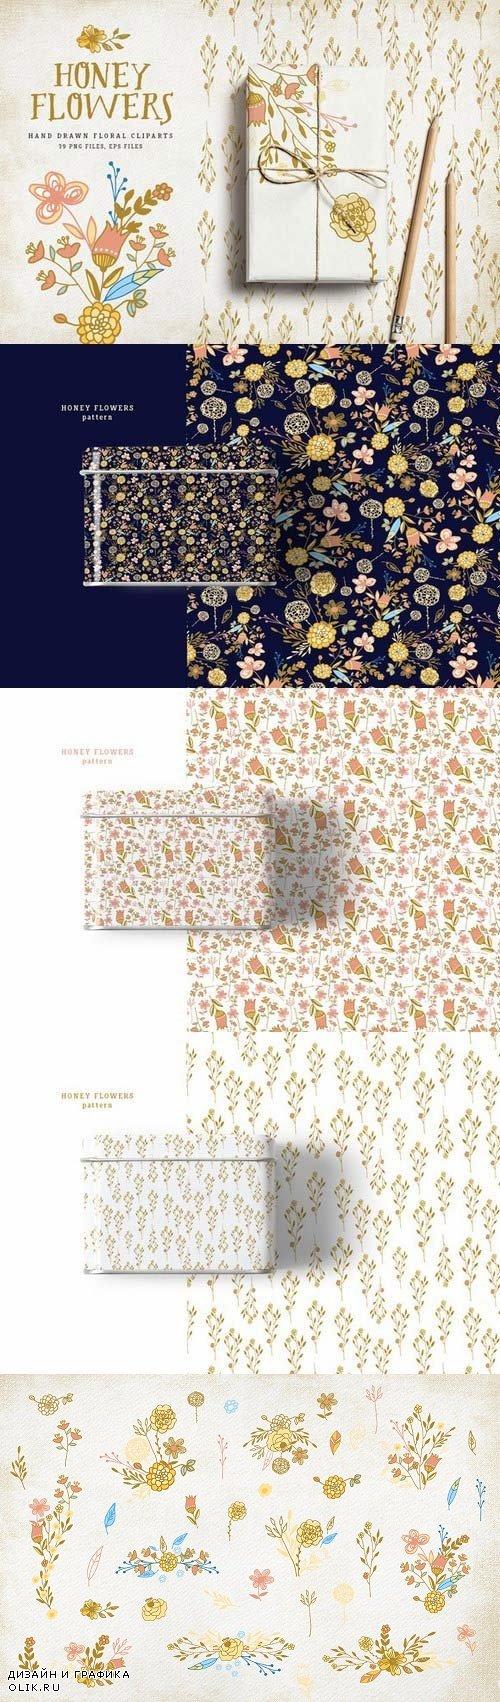 Honey Flowers - 663613